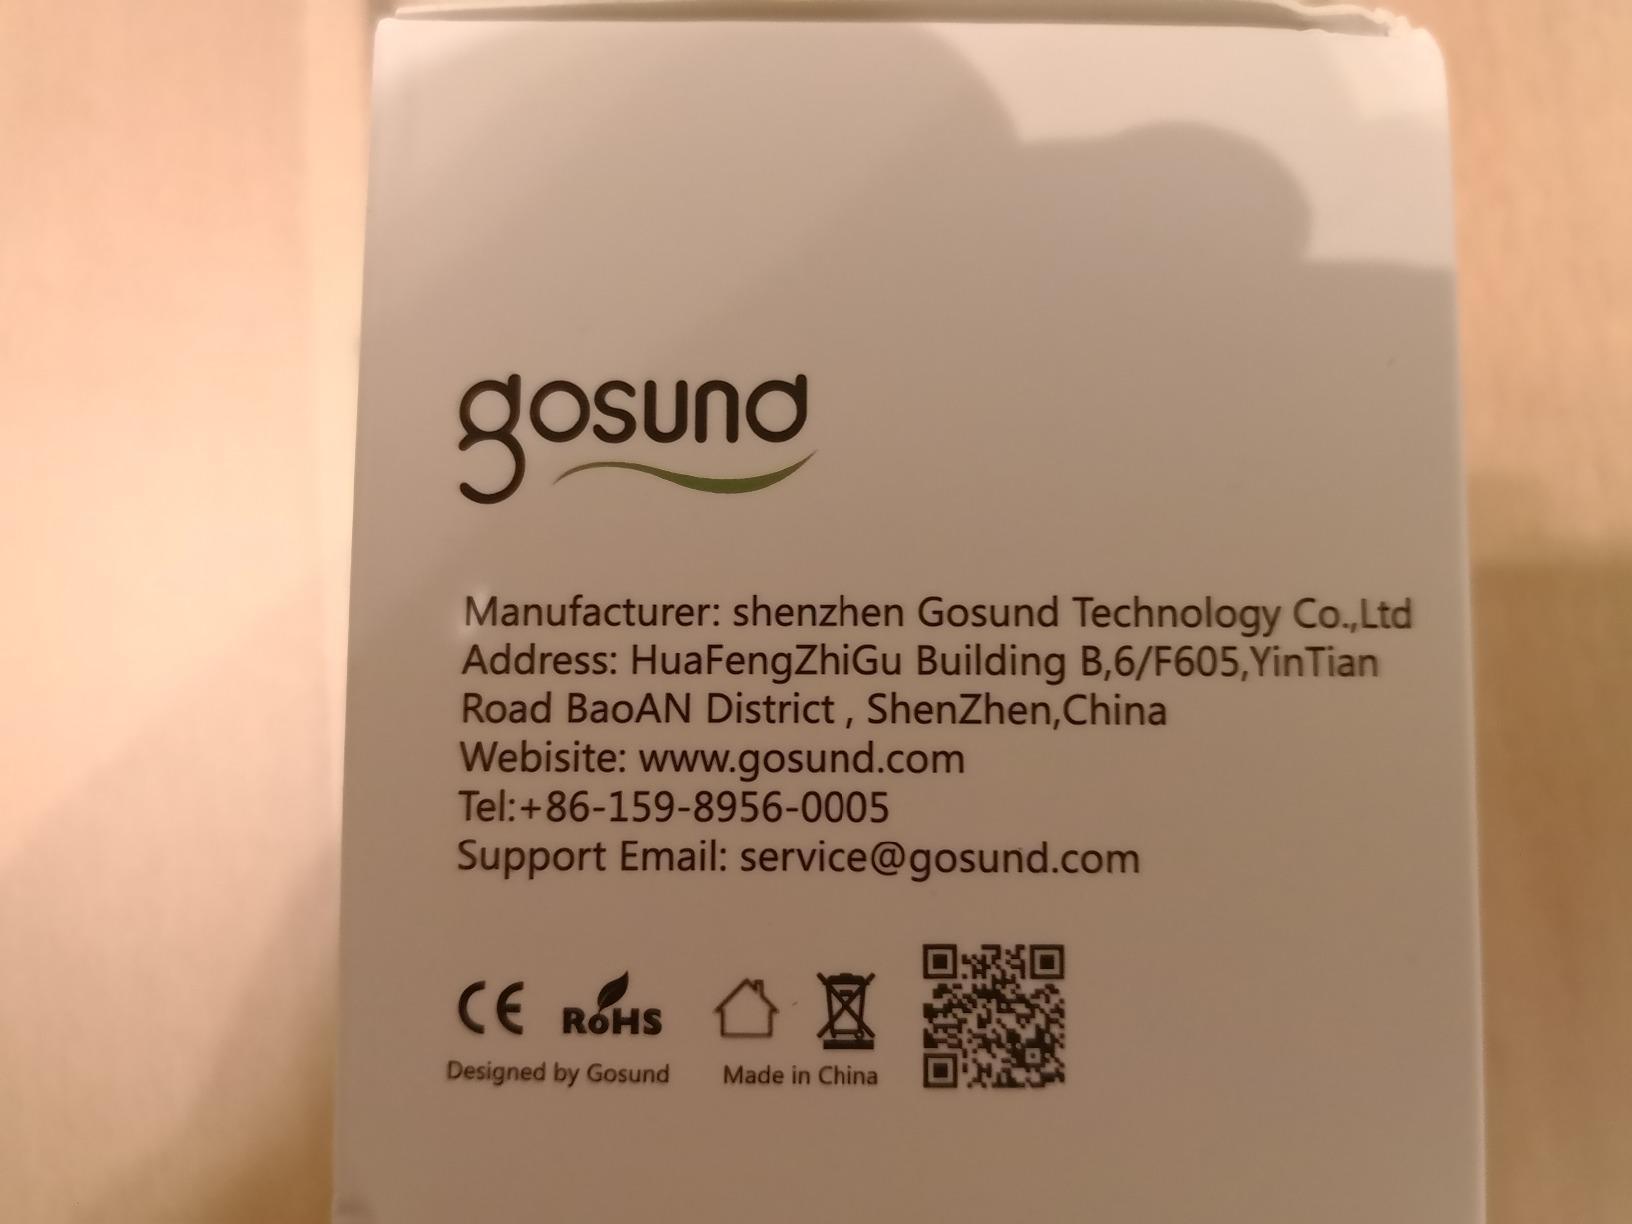 Smarte Steckdose Alexa WLAN Steckdose, Stromverbrauch messen Timer